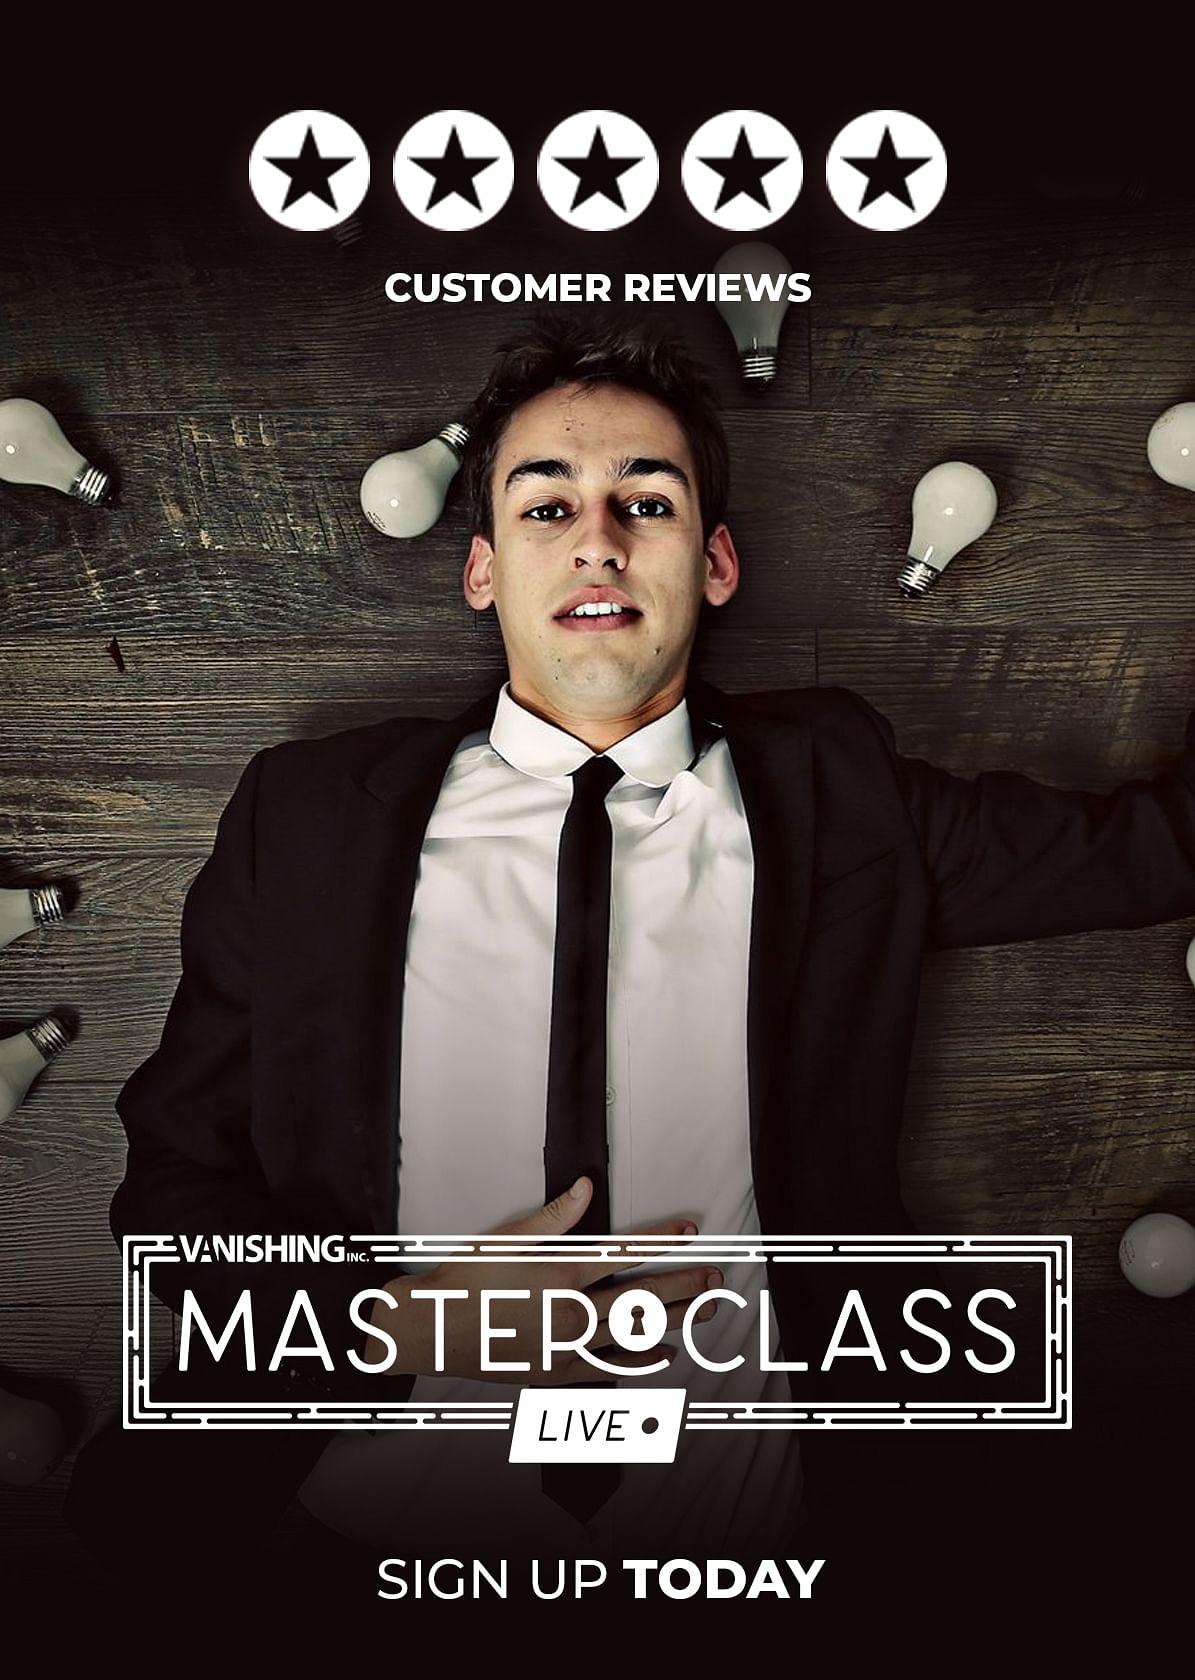 Masterclass: Live